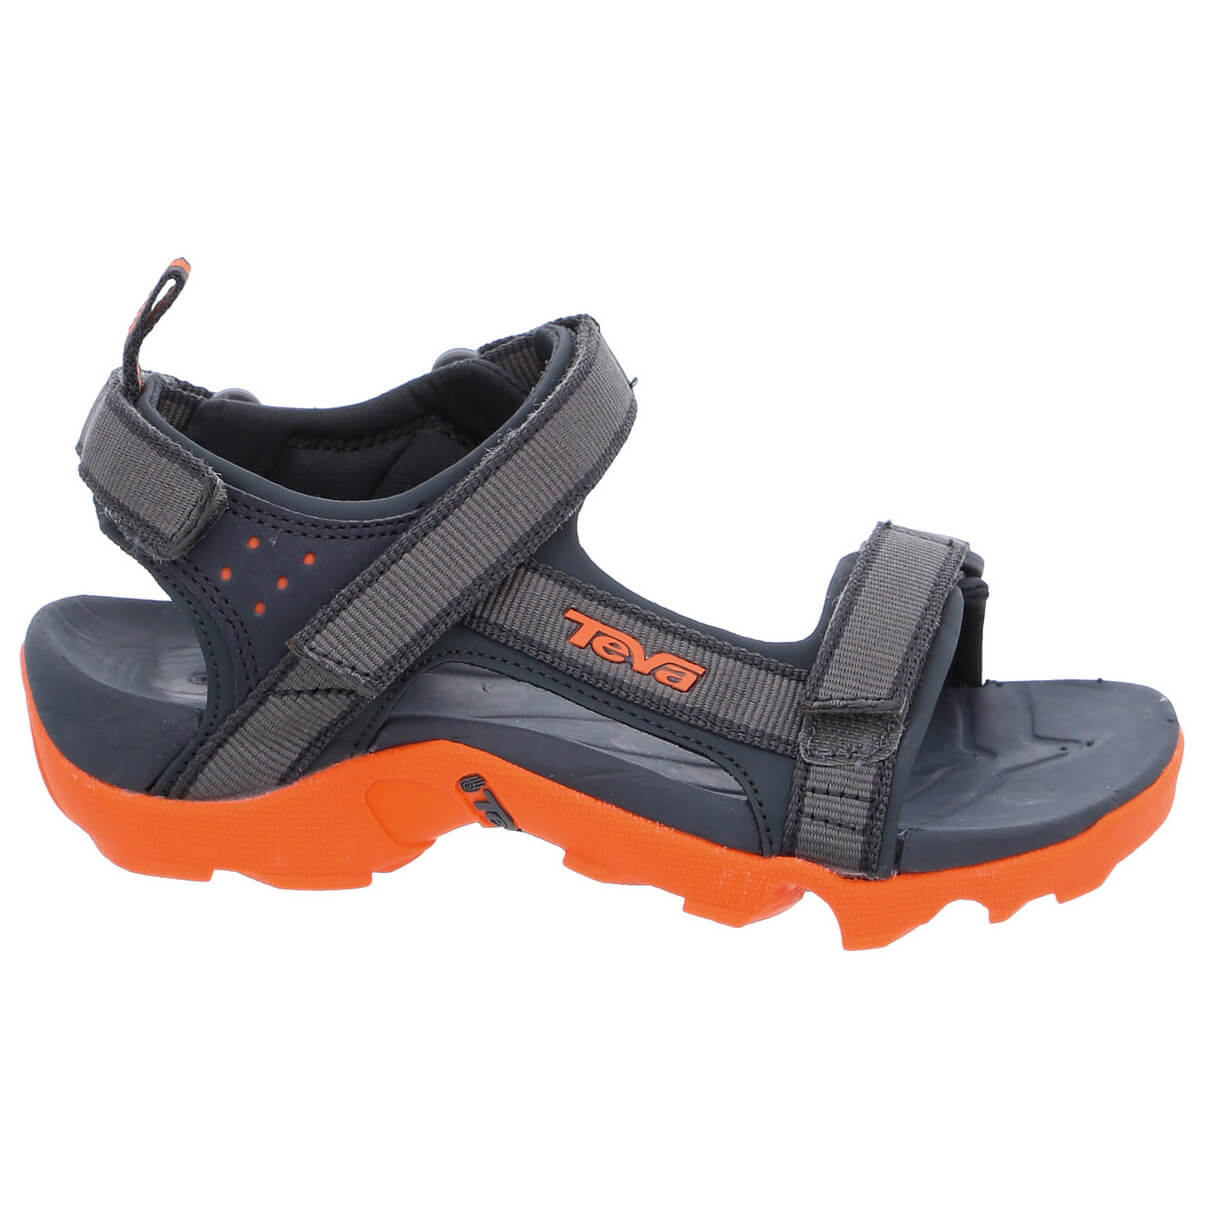 3b63e7c6bf14 teva kinder sandalen Teva Youth s Tanza - Sandalen Kinder online kaufen